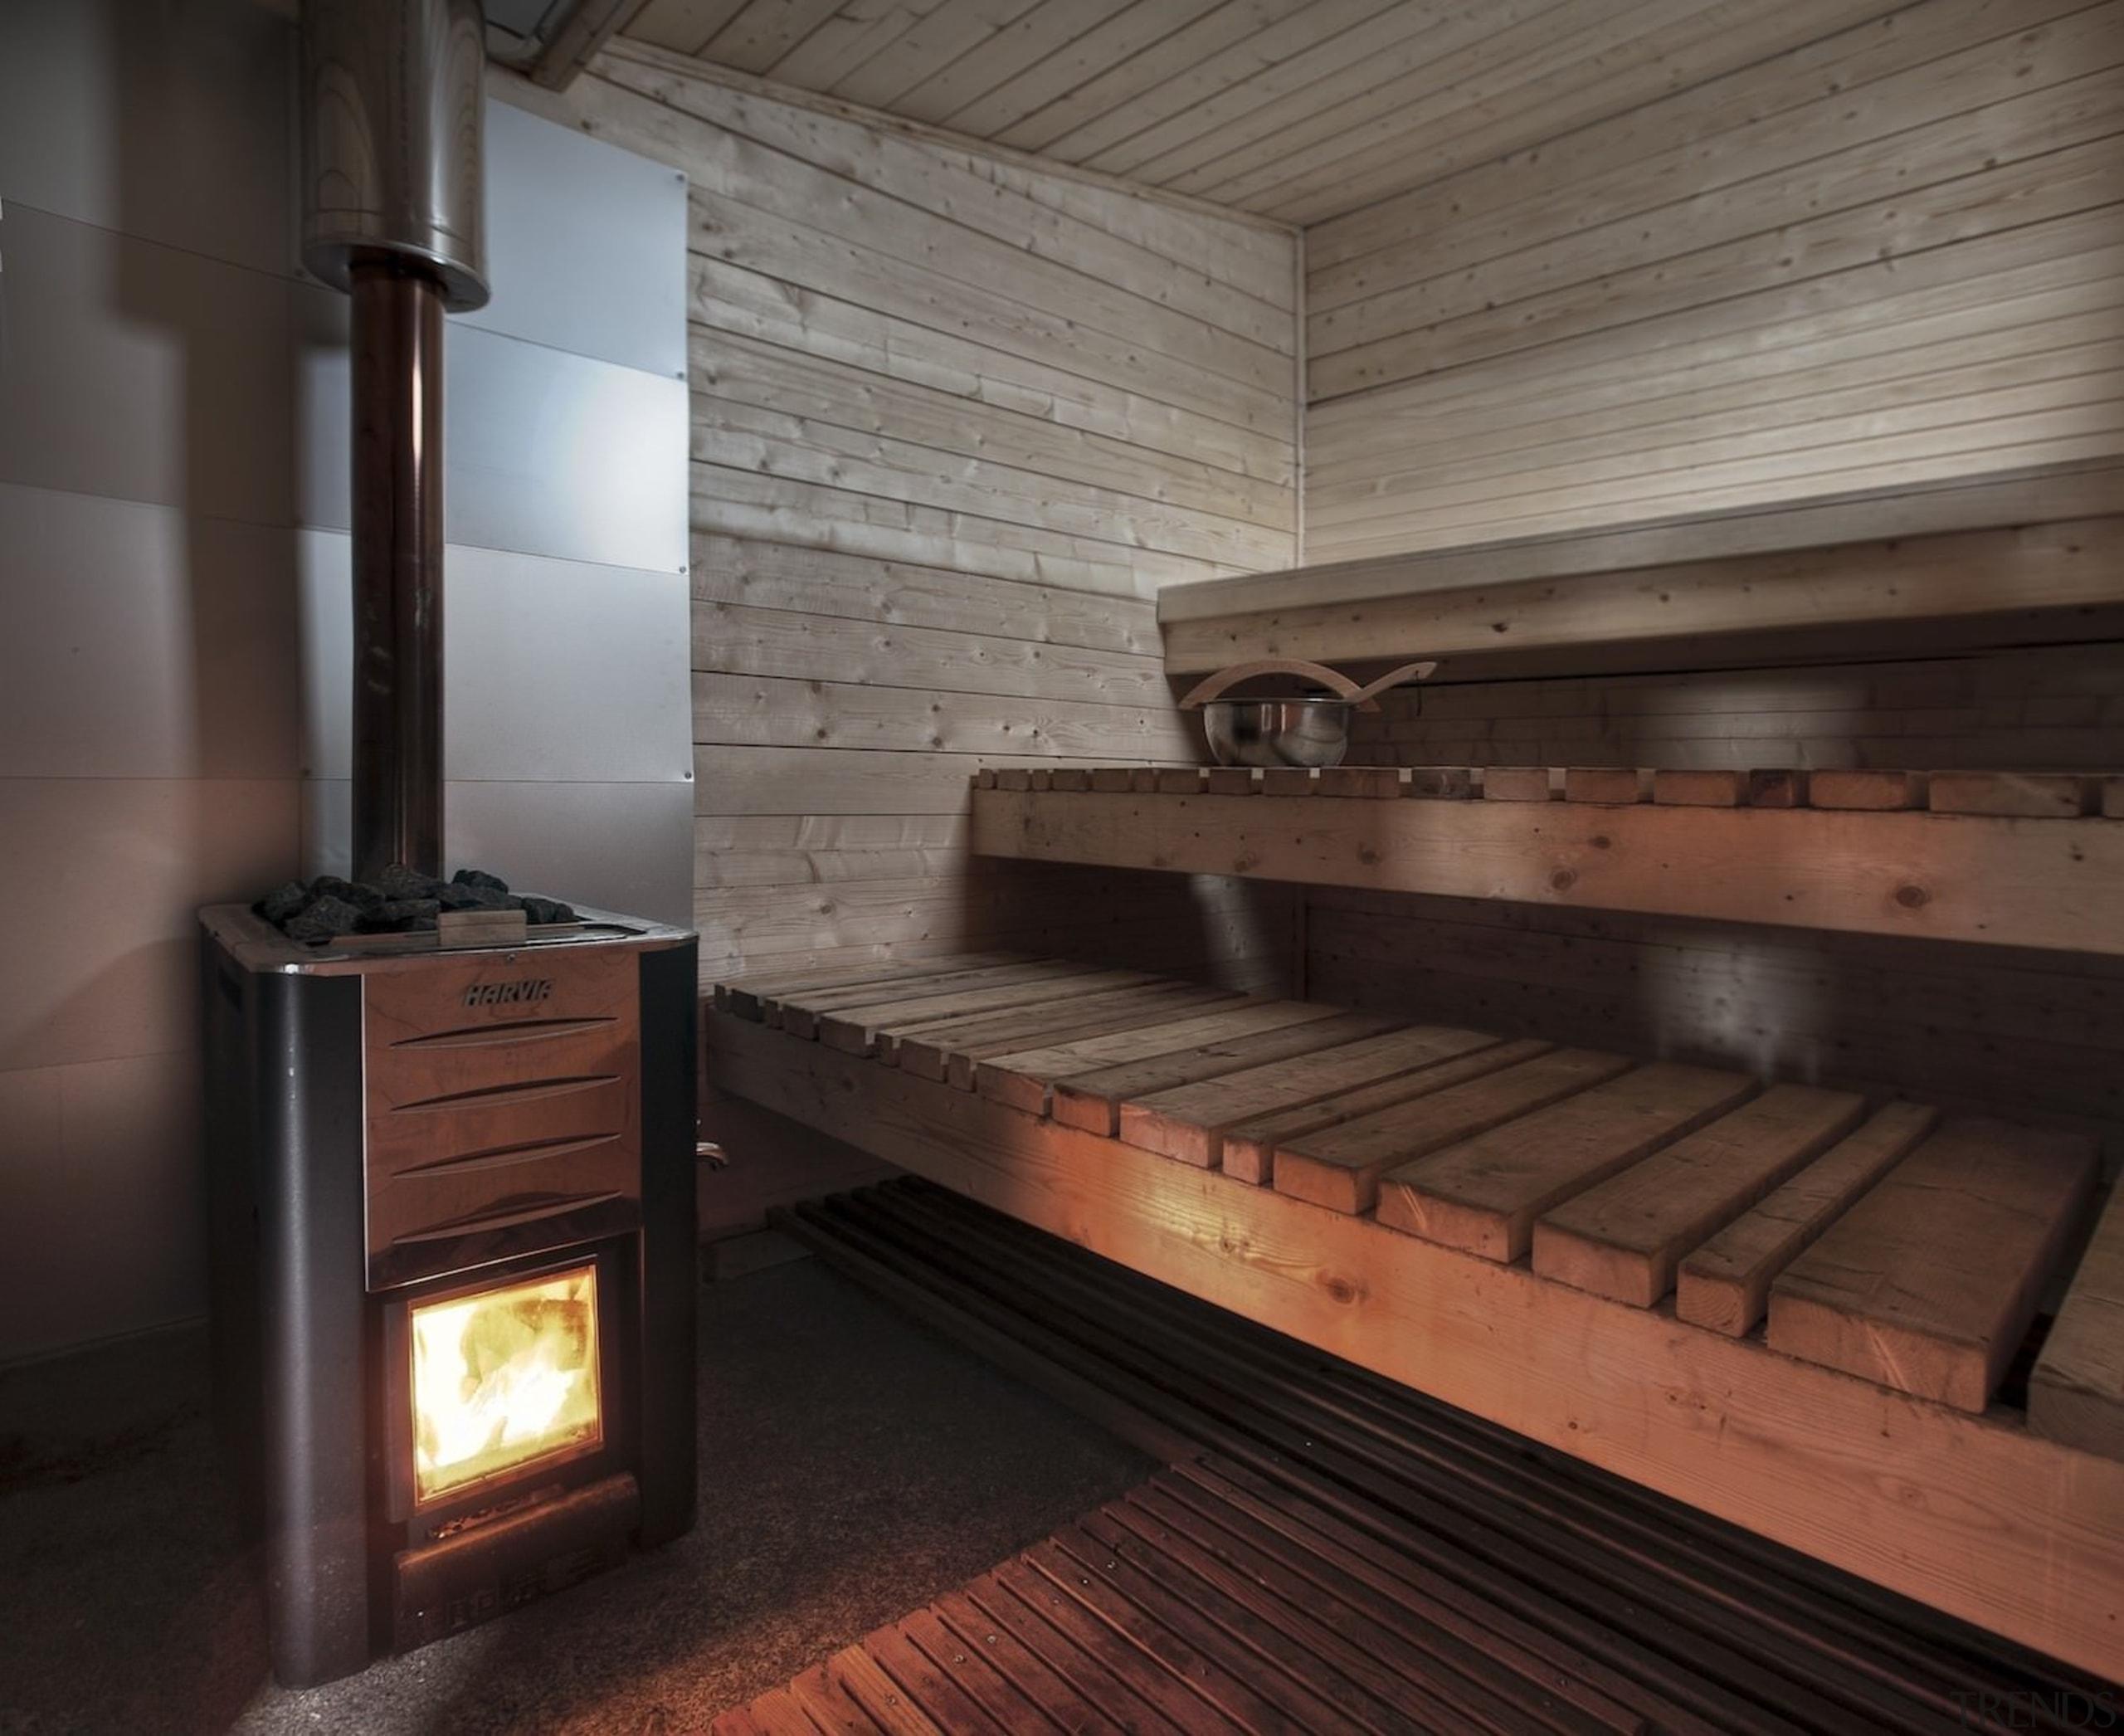 Architect: TYIN tegnestue ArchitectsPhotographer: Pasi Aalto / hearth, wood, black, gray